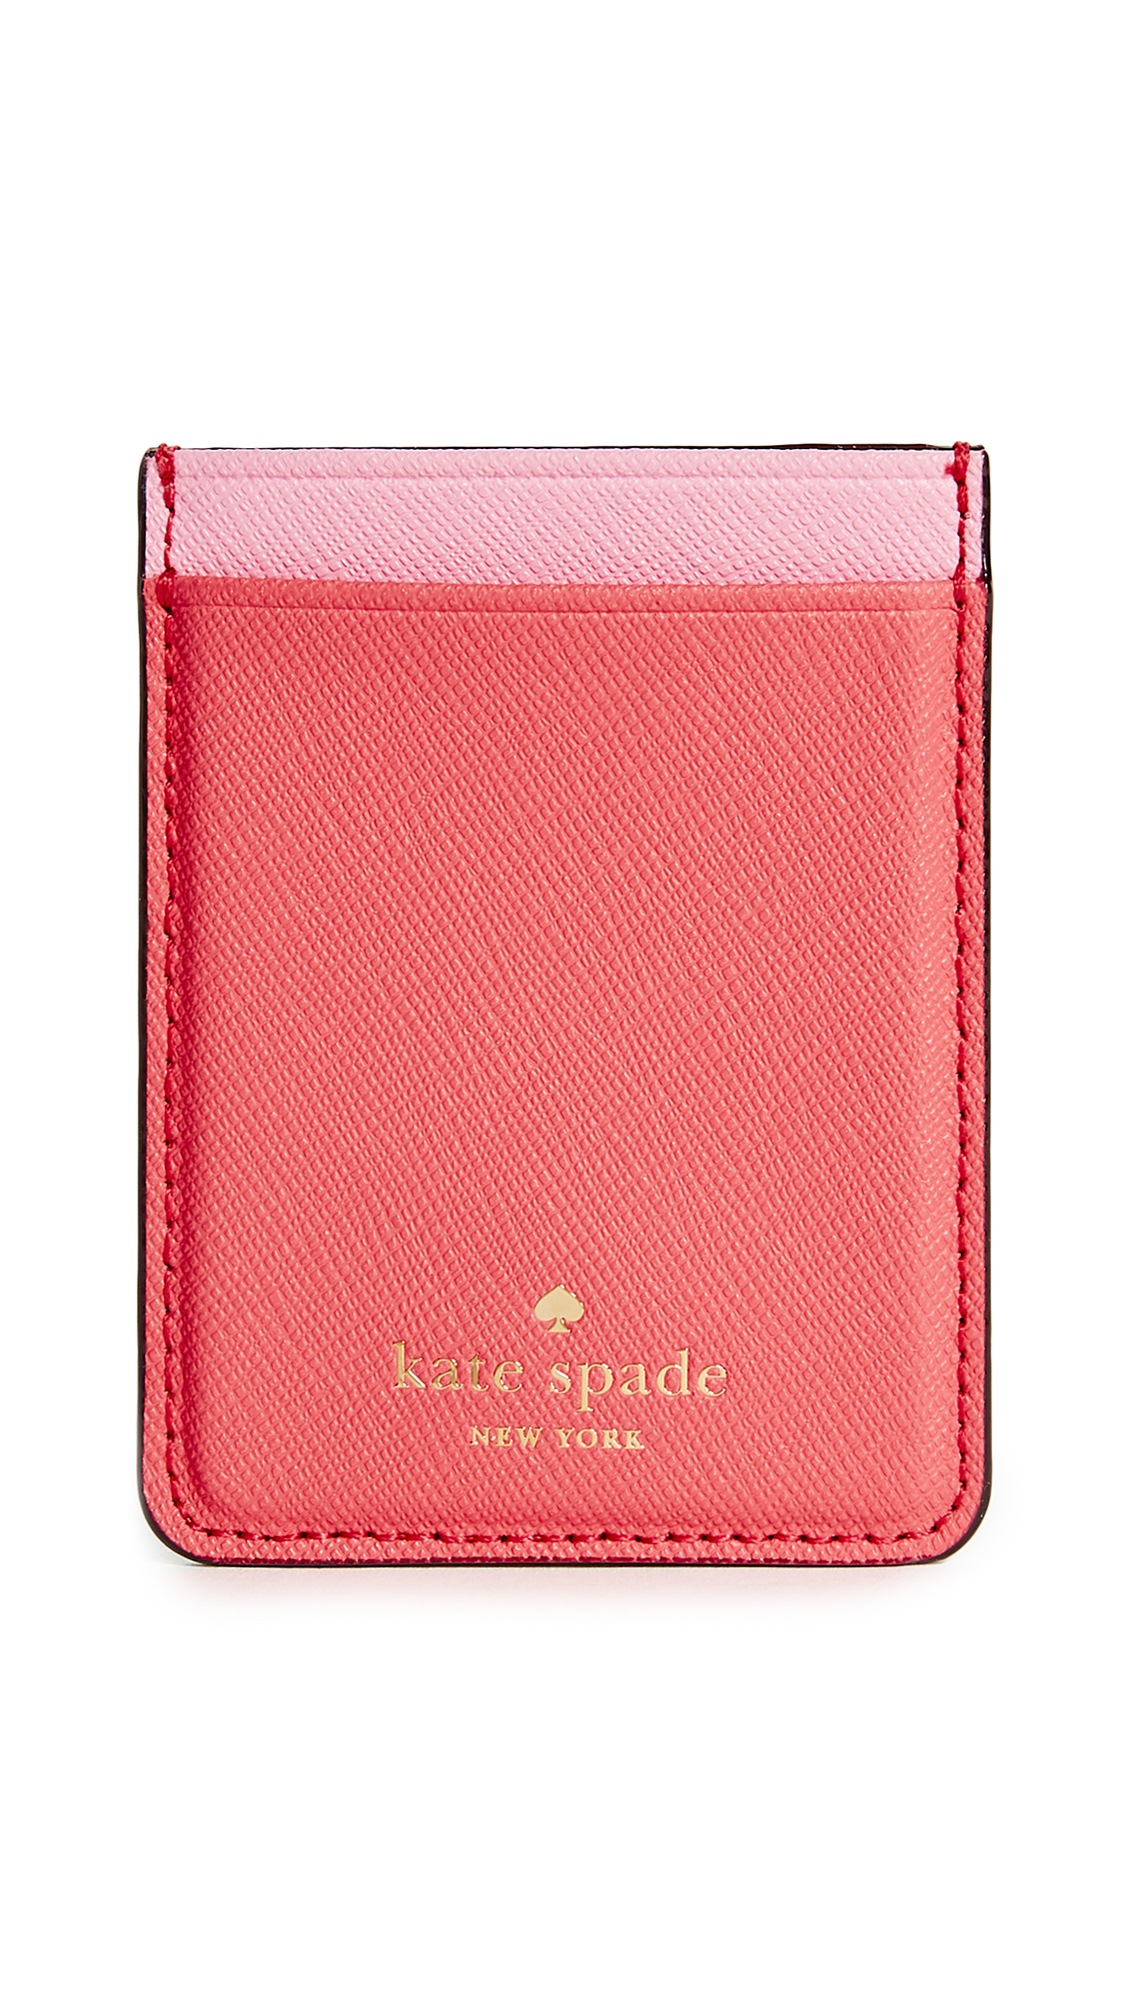 Kate Spade New York Double Sticker Phone Pocket - Flamingo Red Multi